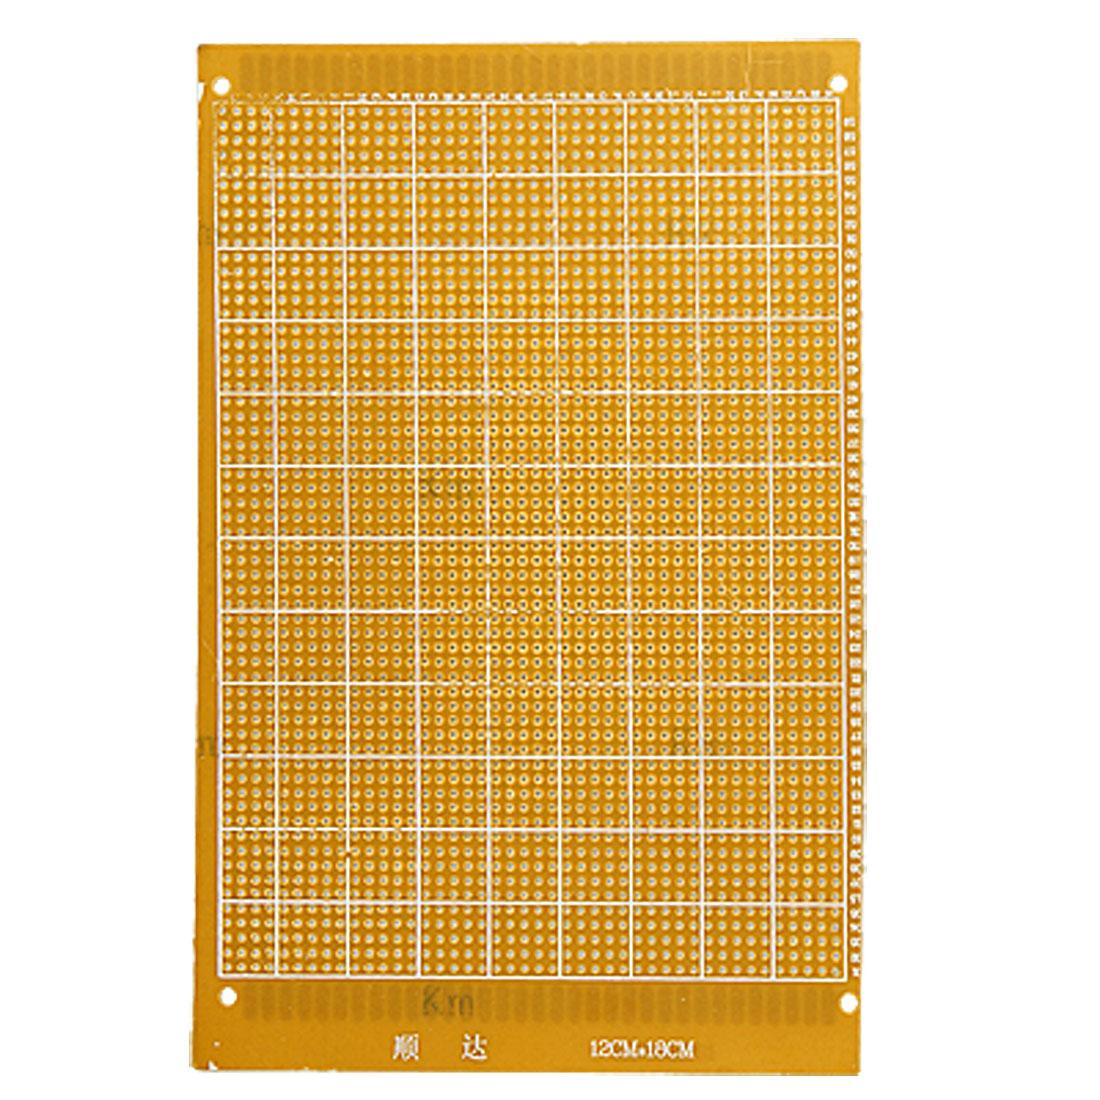 Single Side Copper Panel Prototype PCB Board 12 x 18cm